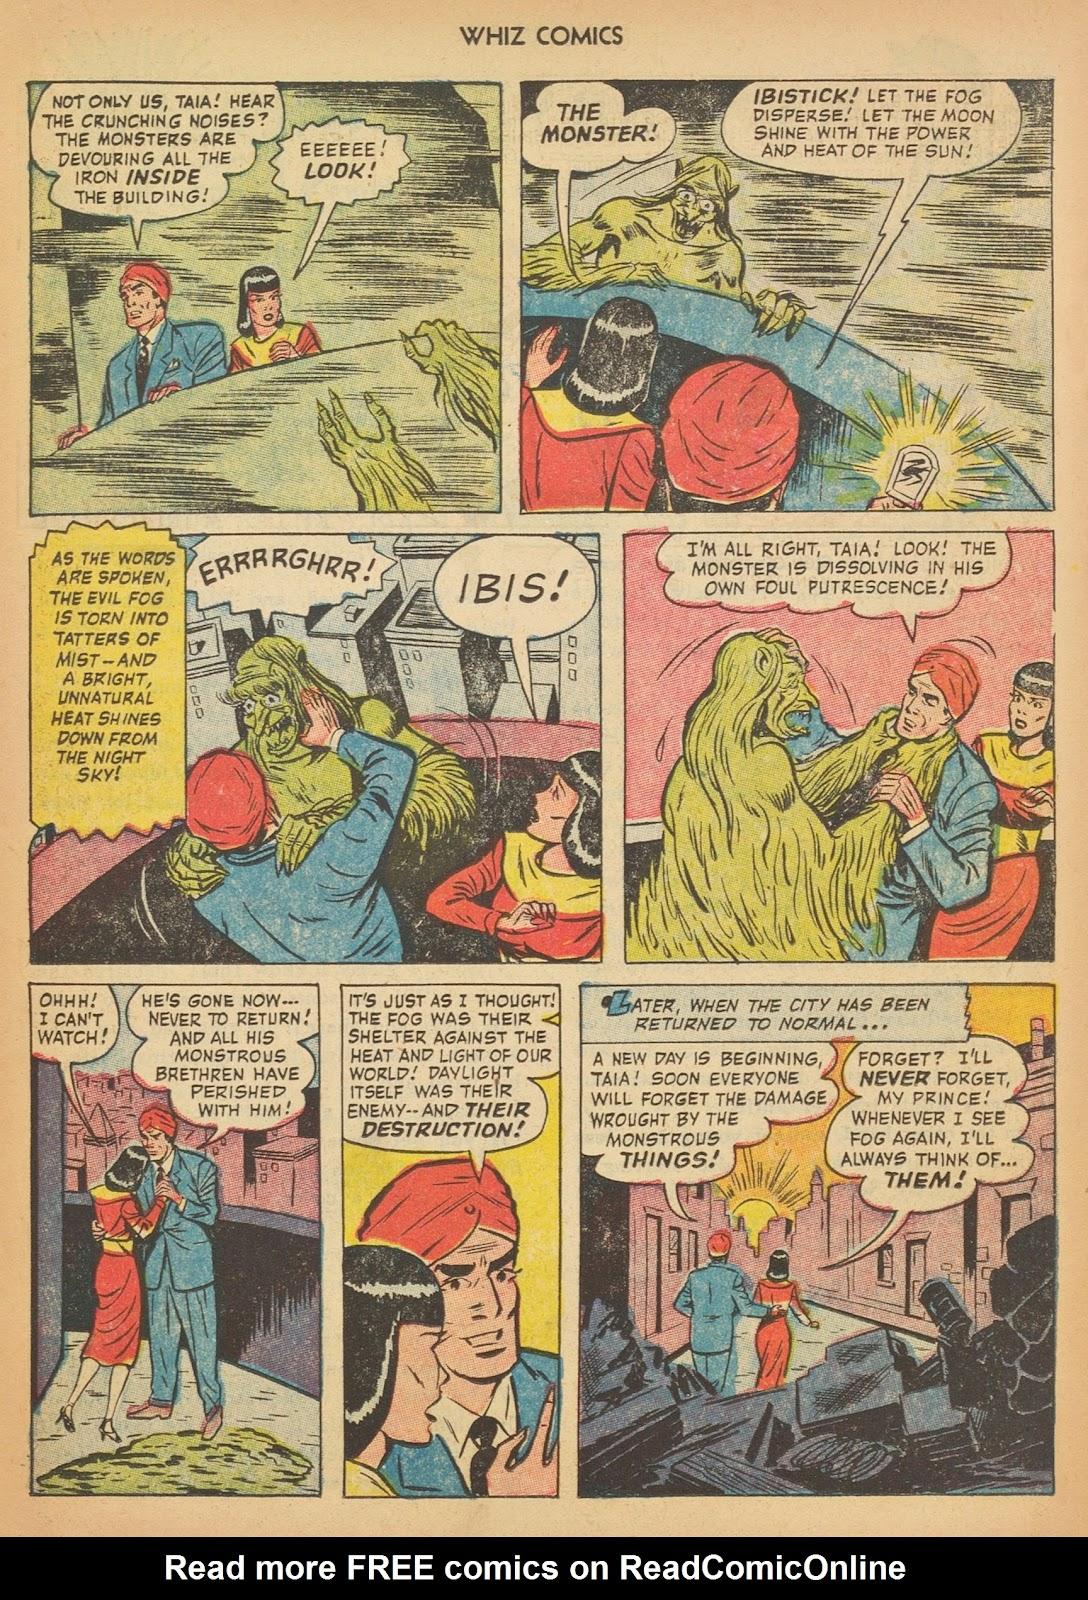 Read online WHIZ Comics comic -  Issue #153 - 15